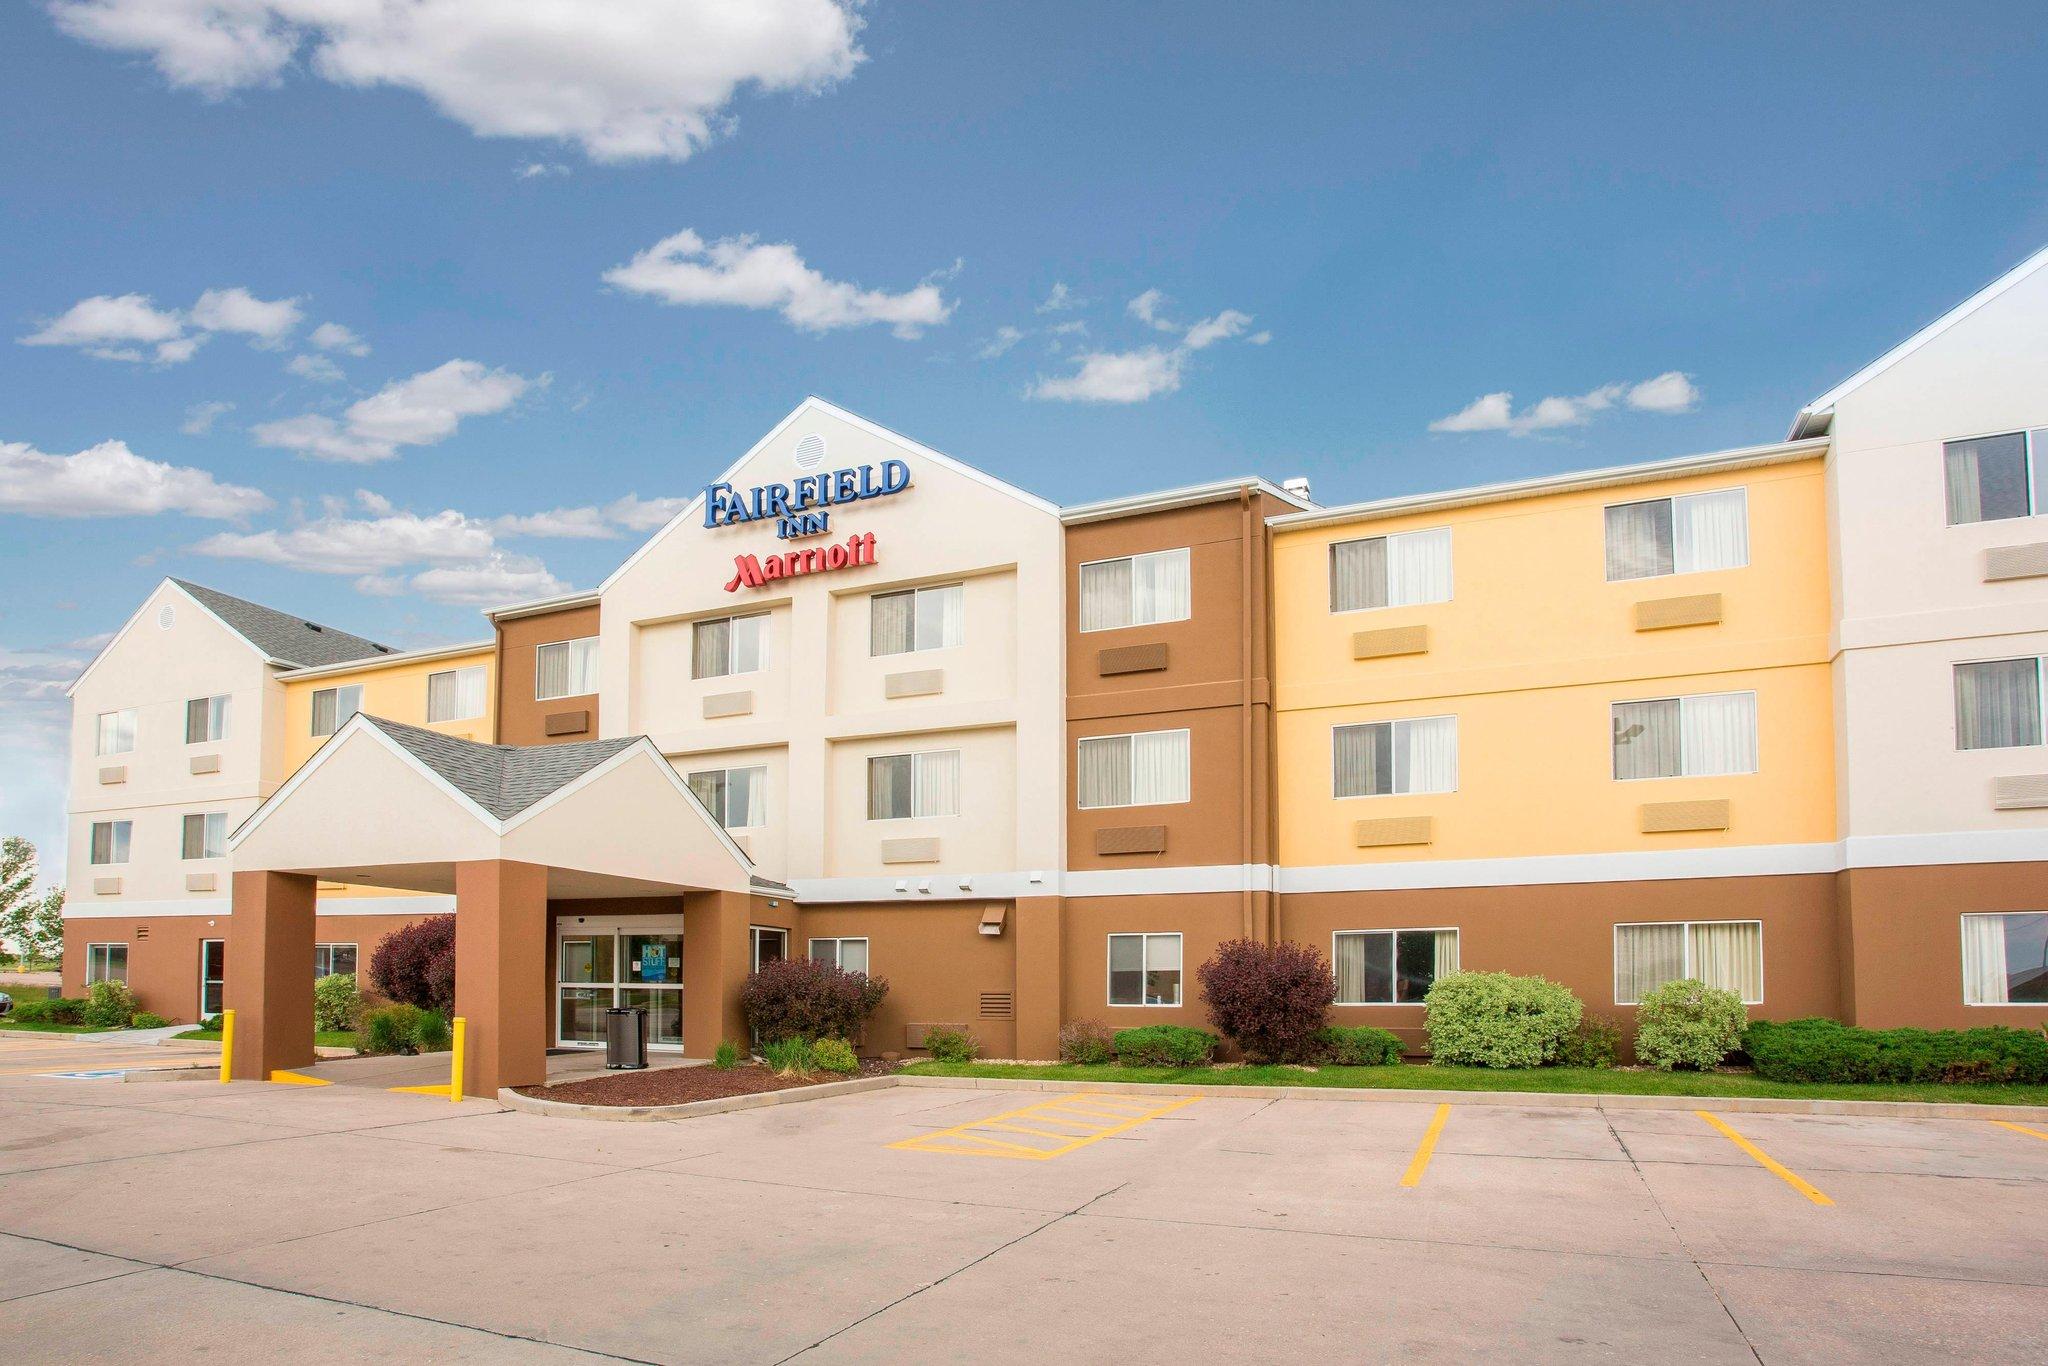 Fairfield Inn and Suites by Marriott Greeley